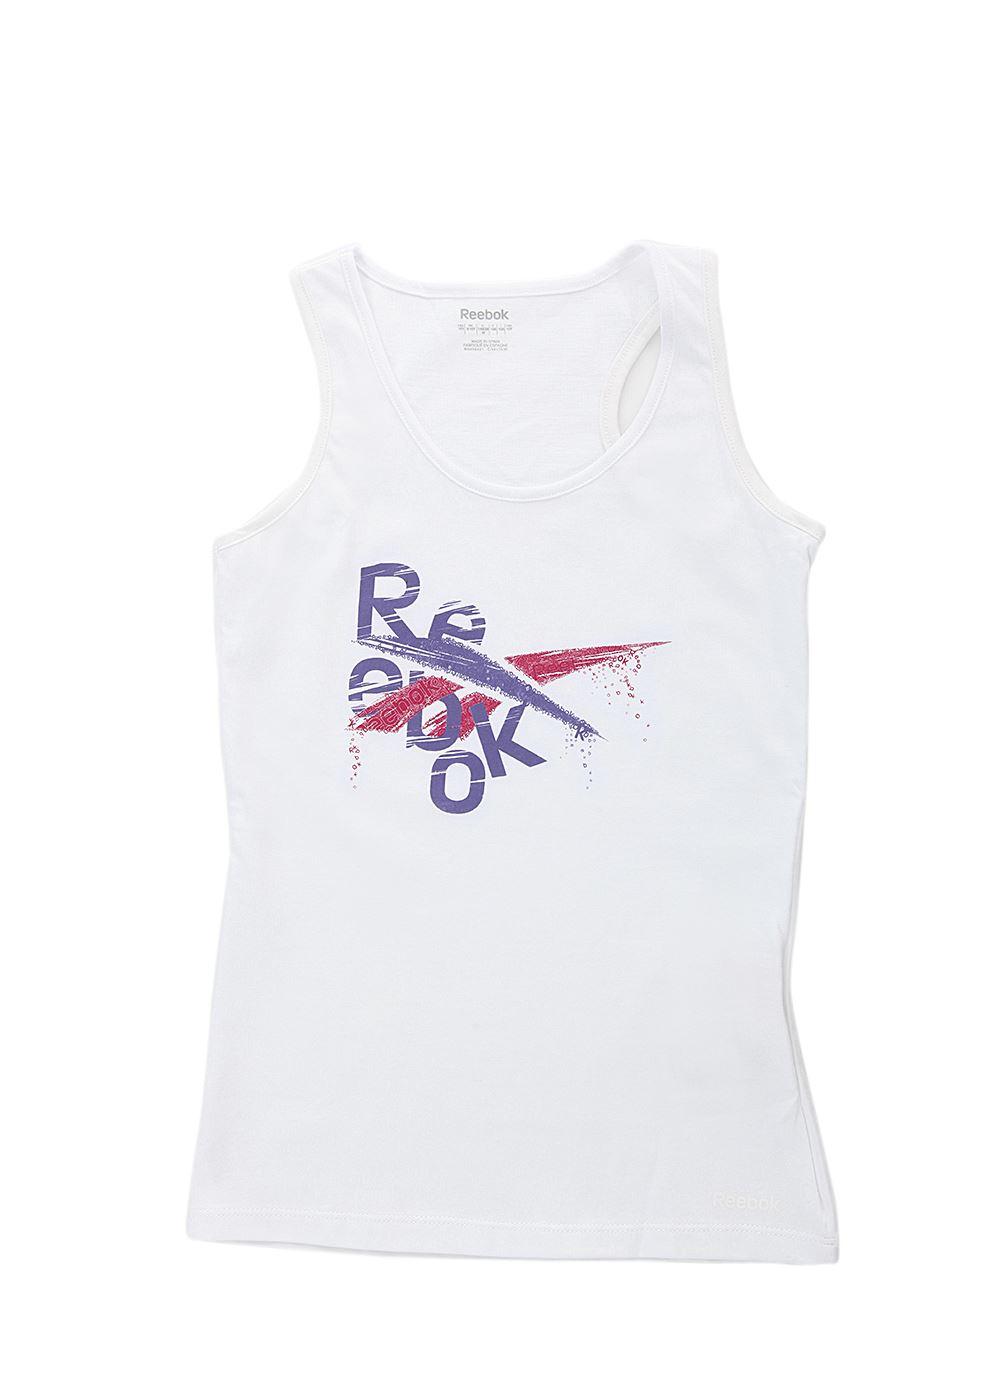 Sports Collection - Παιδική Μπλούζα REEBOK